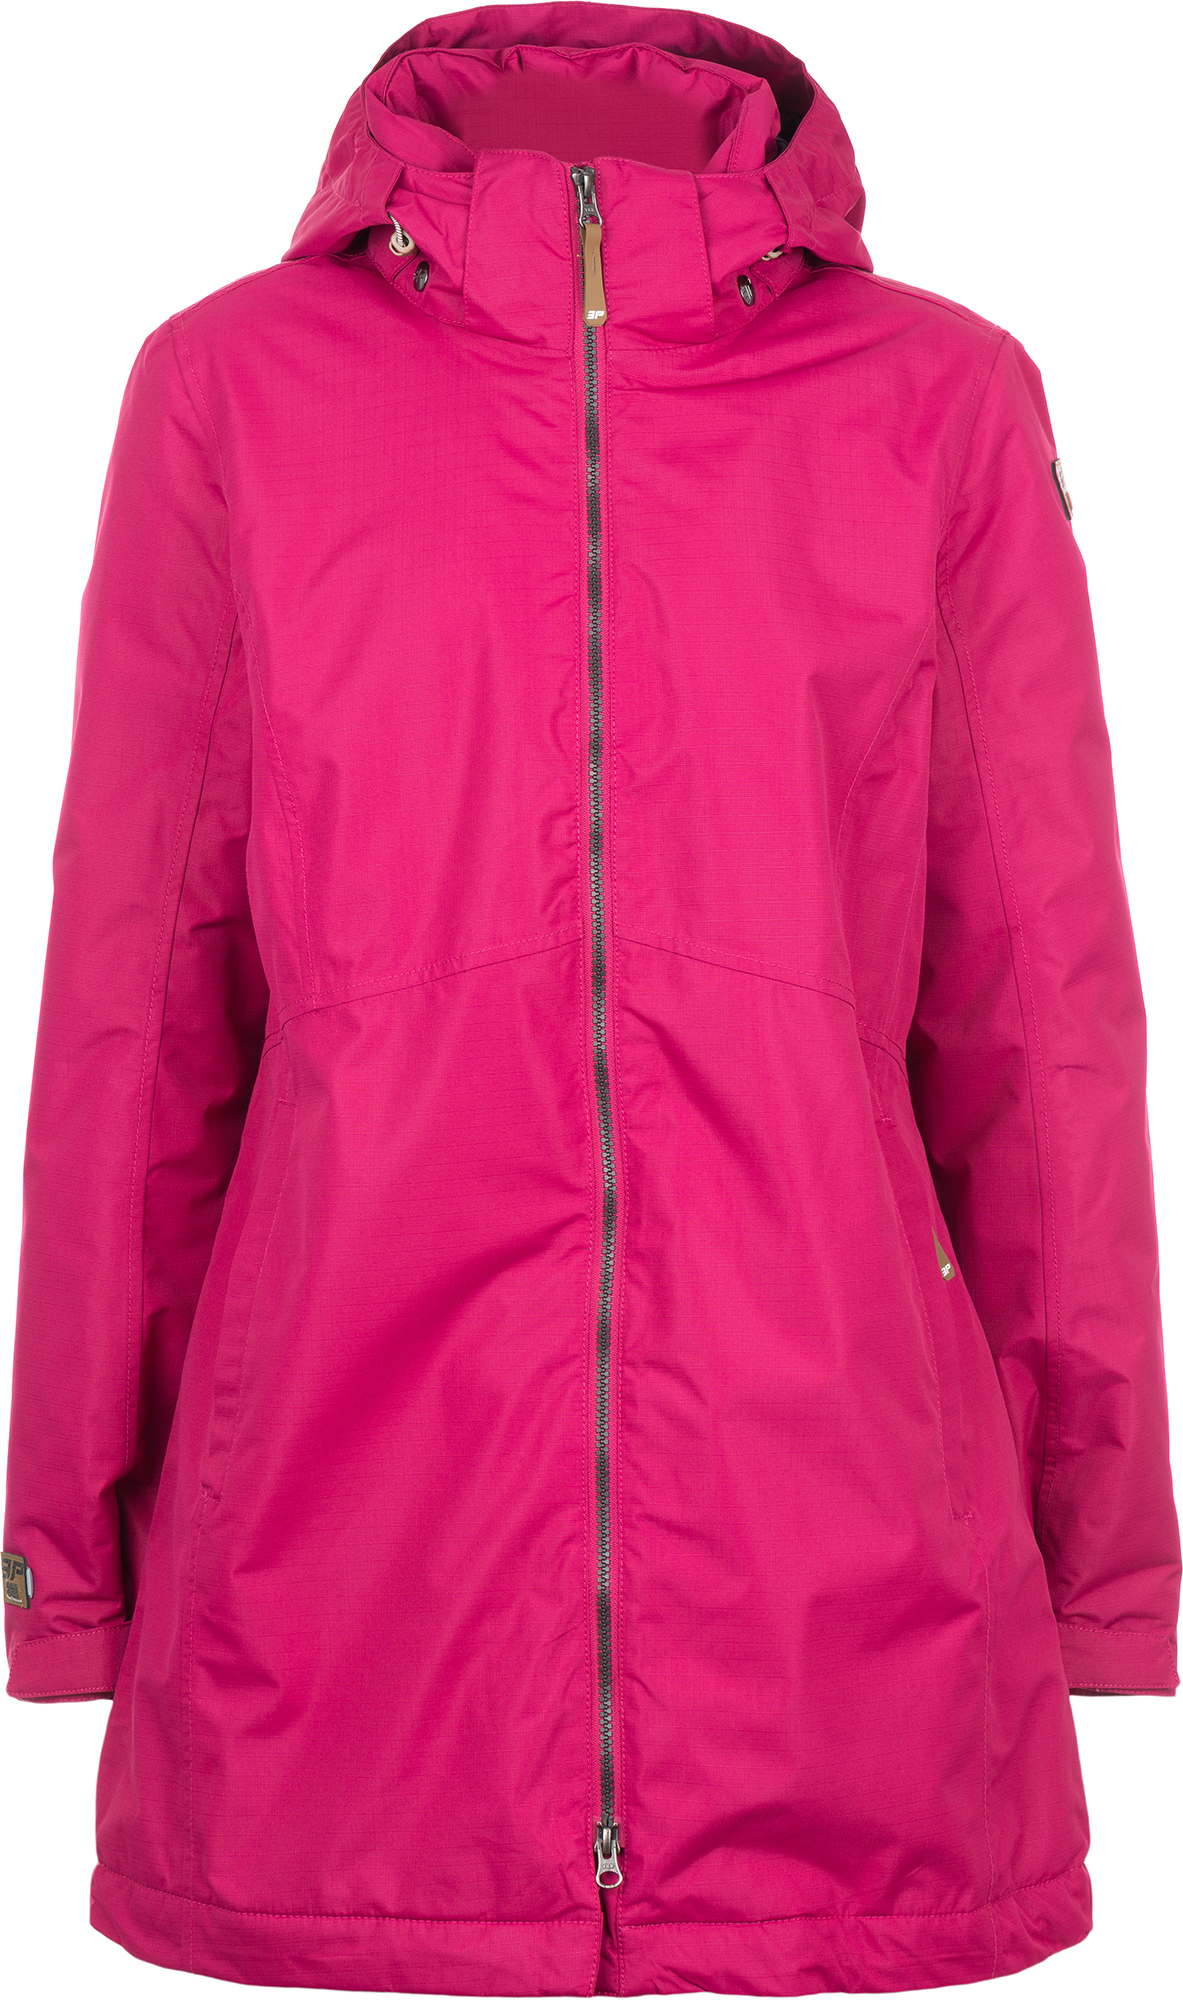 IcePeak Куртка утепленная женская IcePeak Teri куртка утепленная icepeak icepeak ic647ewmwf66